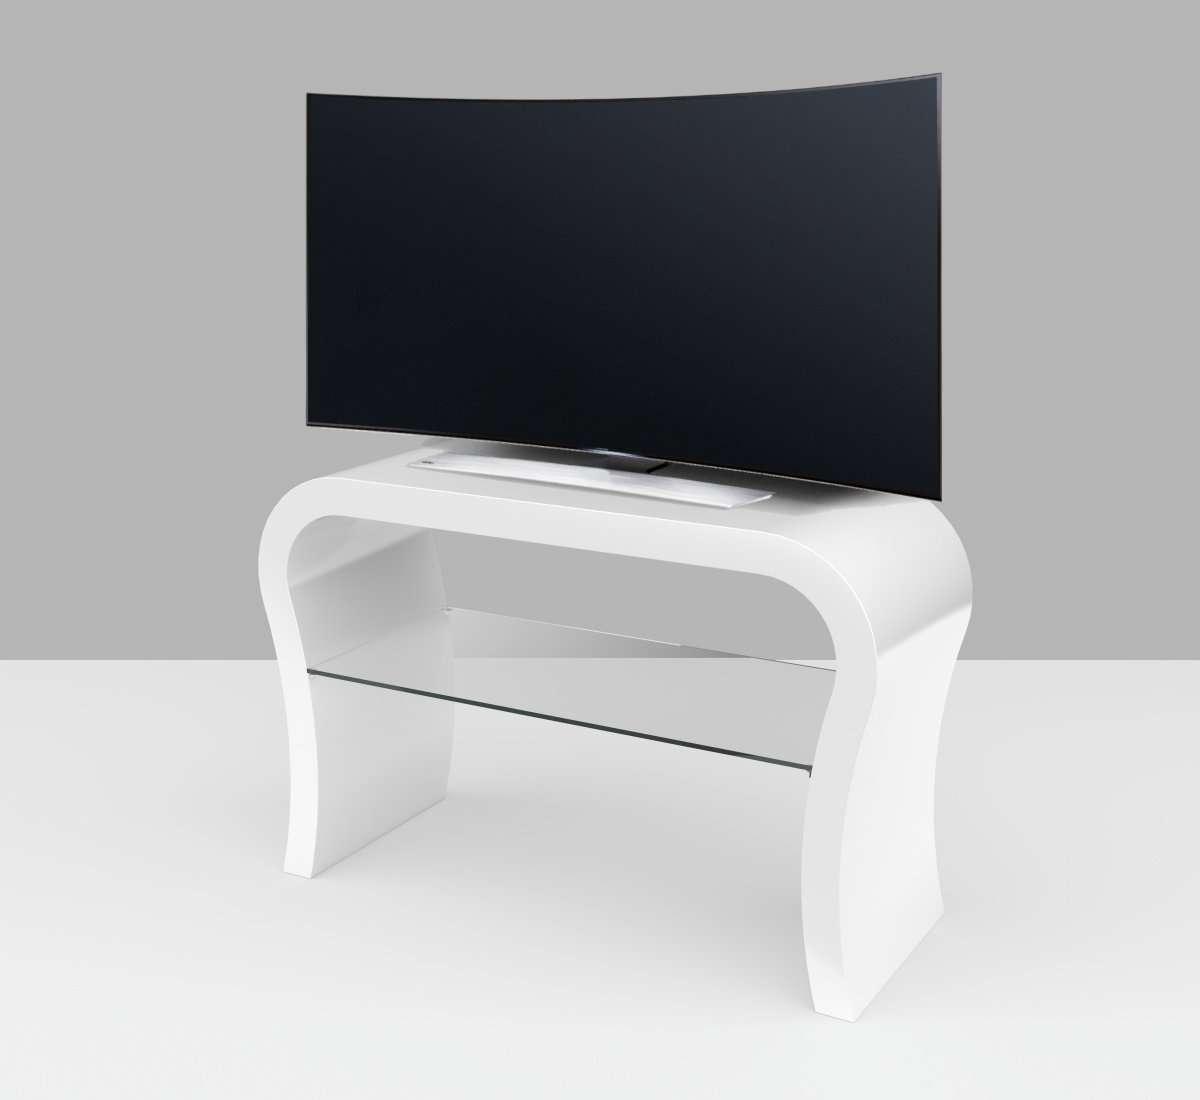 Custom Tv Stands | Custom Made Media Units – Zespoke For Gloss White Tv Cabinets (View 4 of 20)